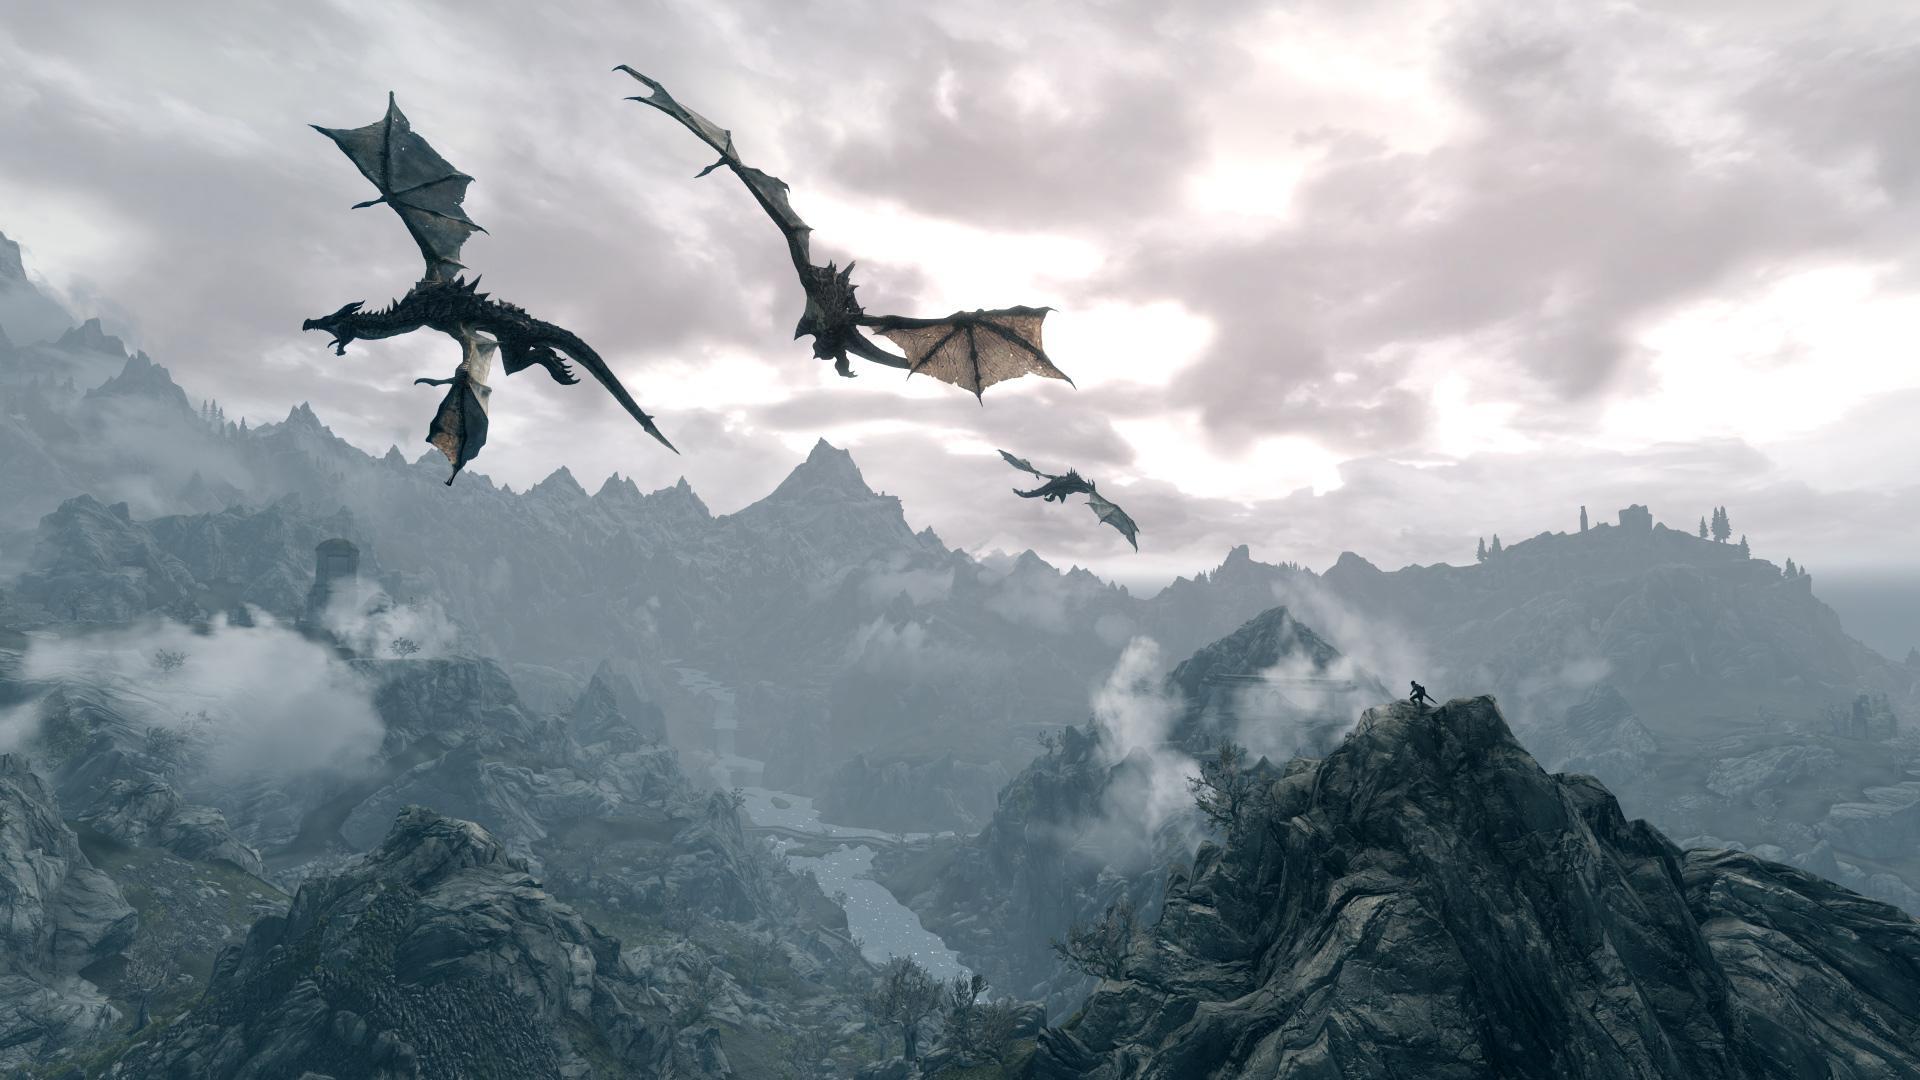 dragon image high quality skyrim dragon xcitefun skyrim dragon pc 1920x1080